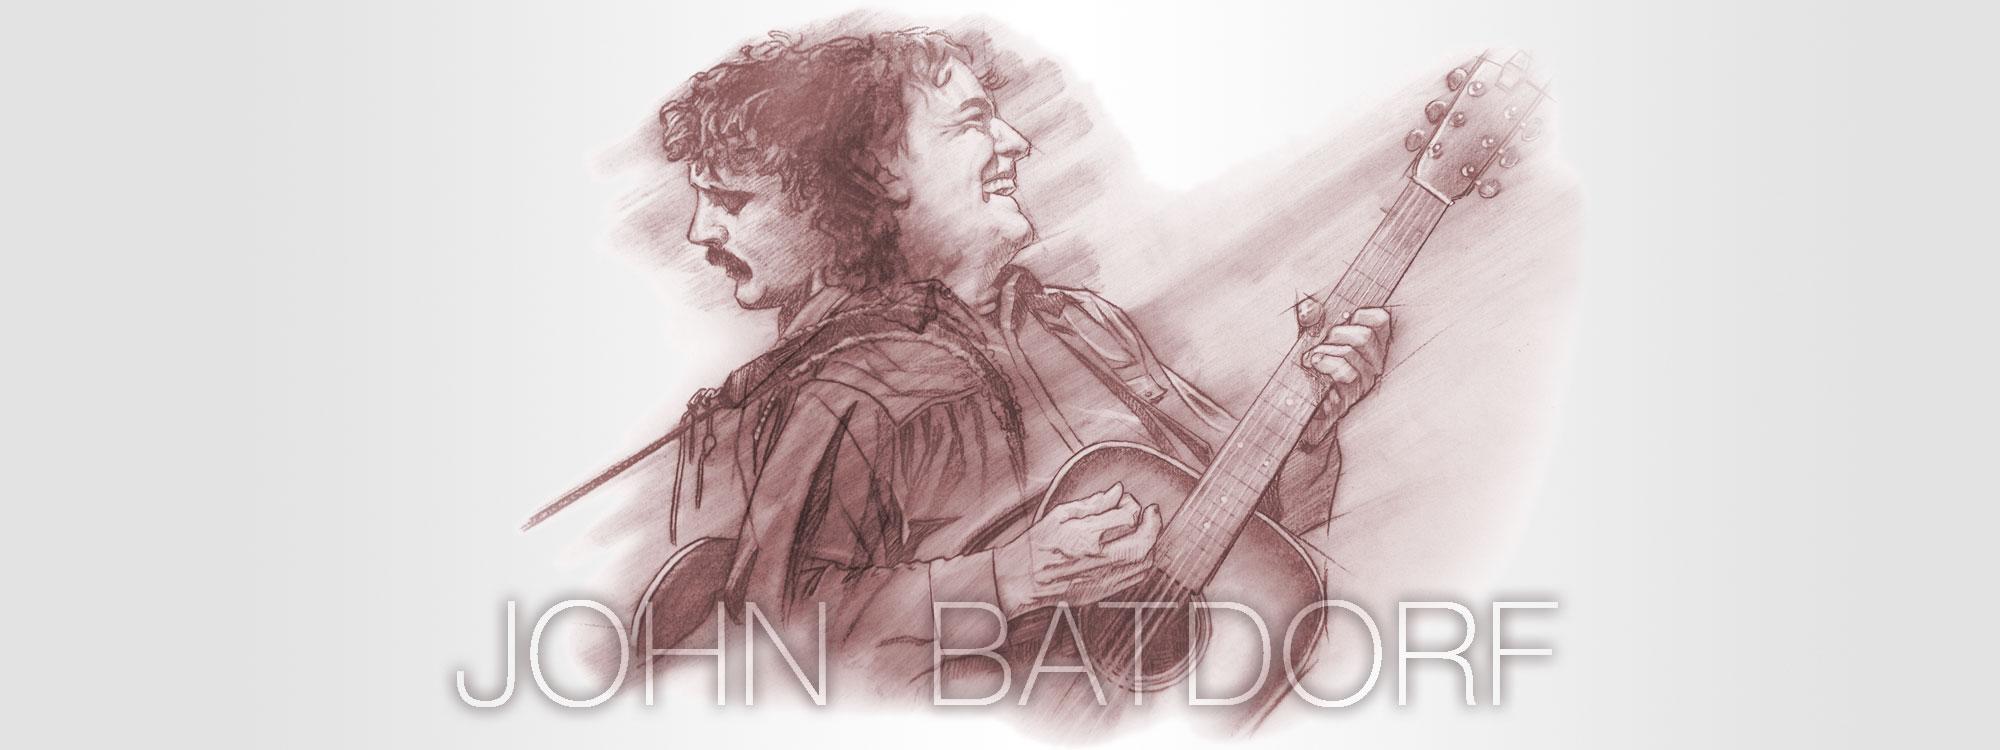 John Batdorf Music